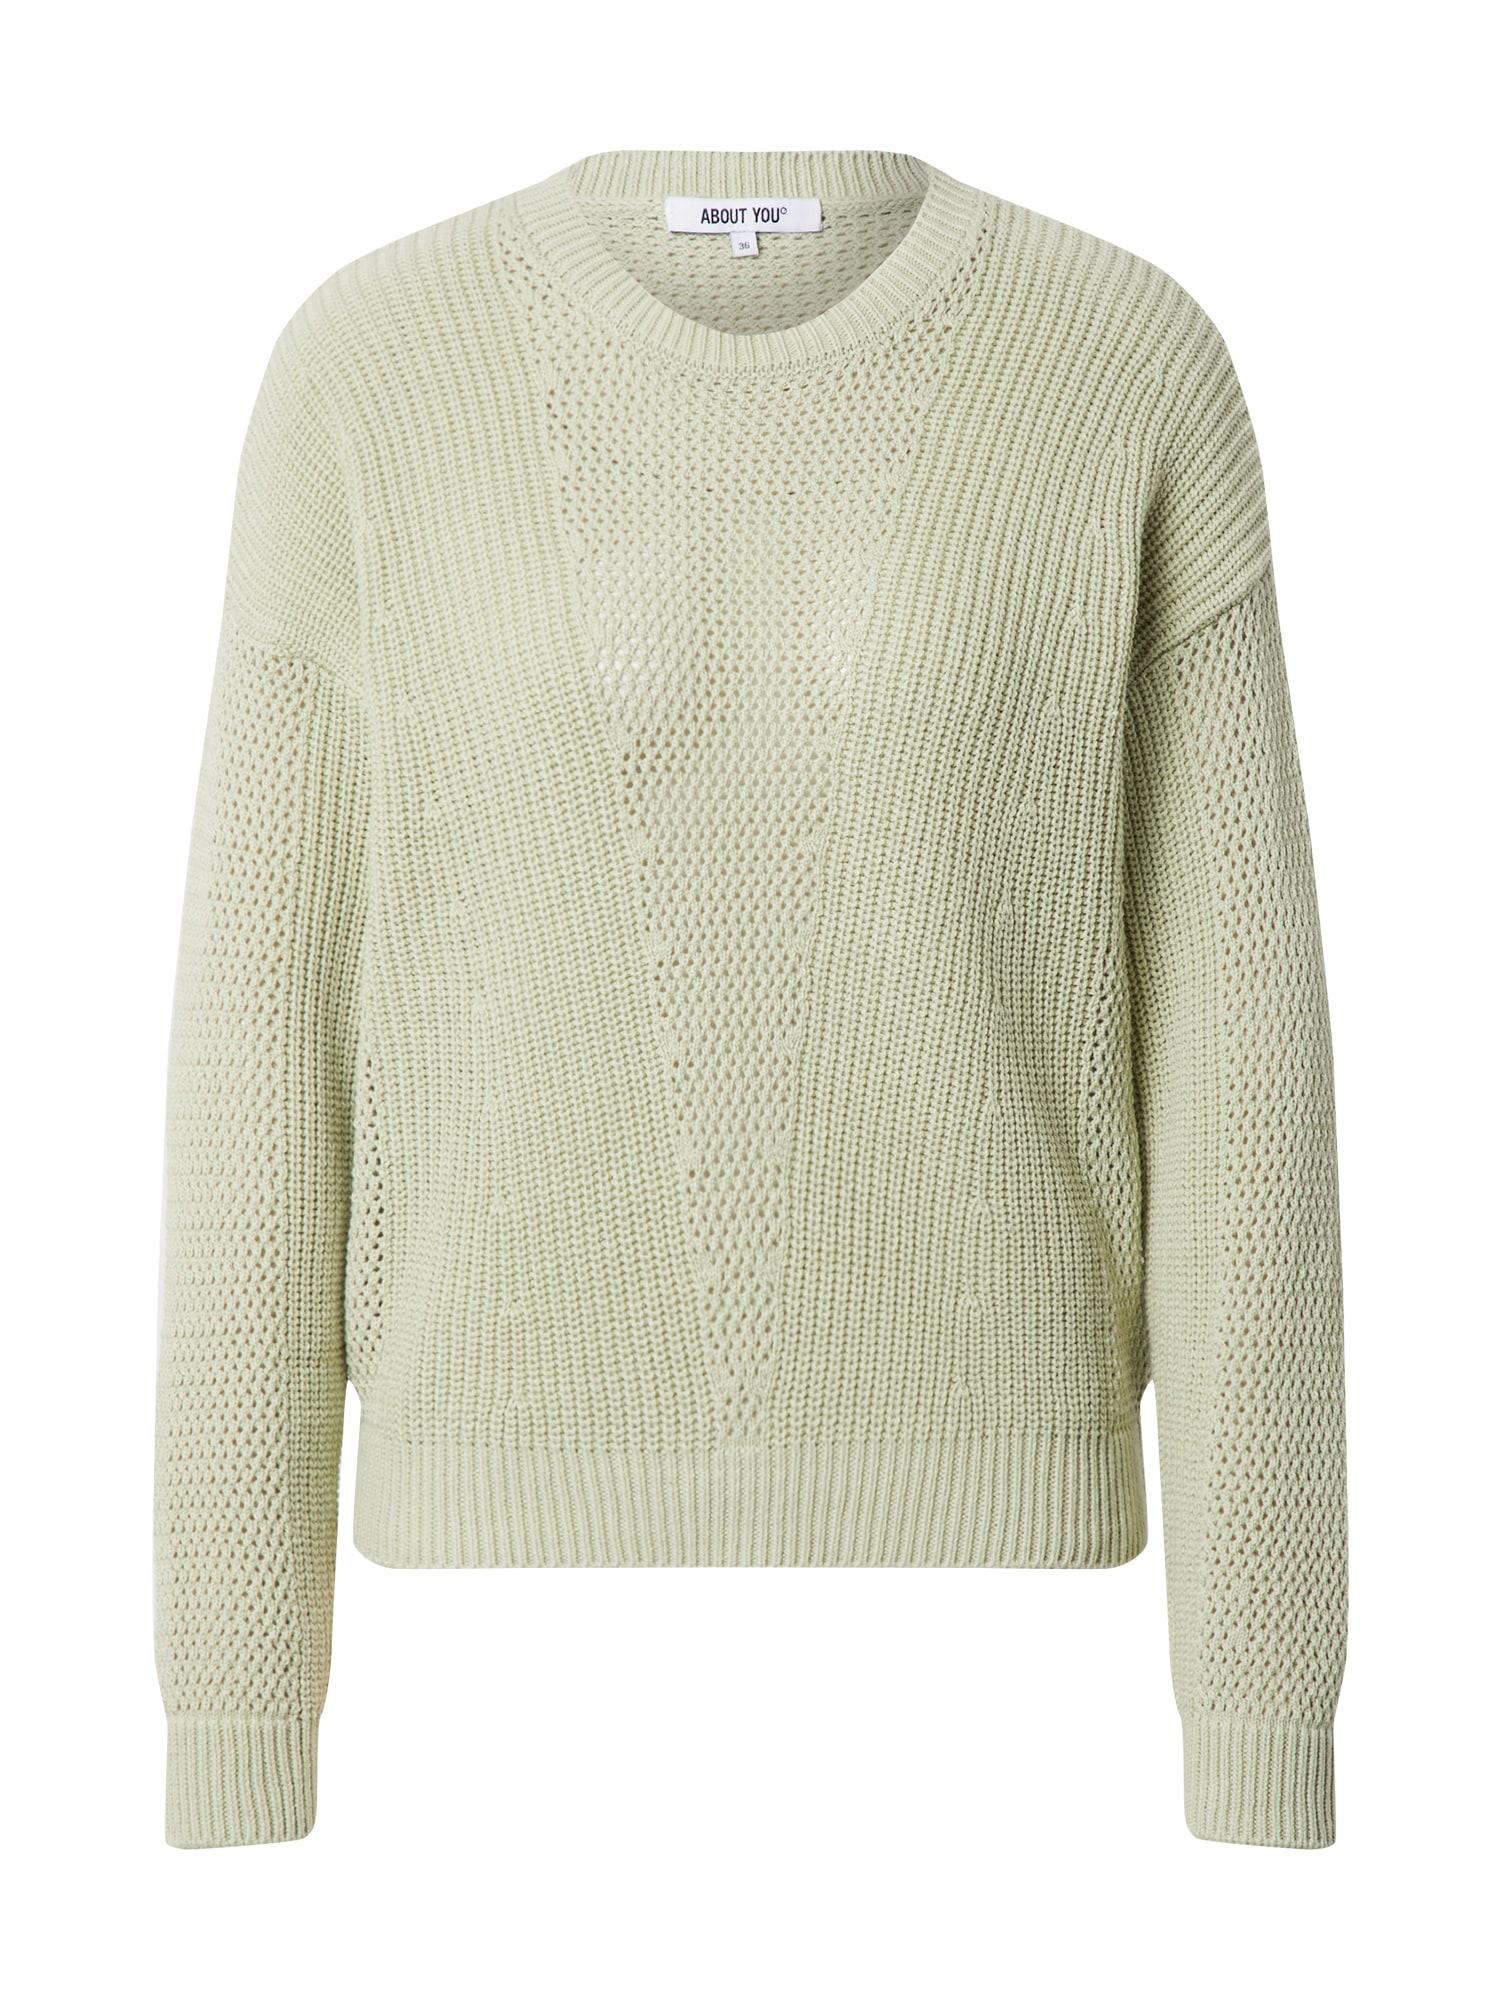 ABOUT YOU Megztinis 'Thea' mėtų spalva